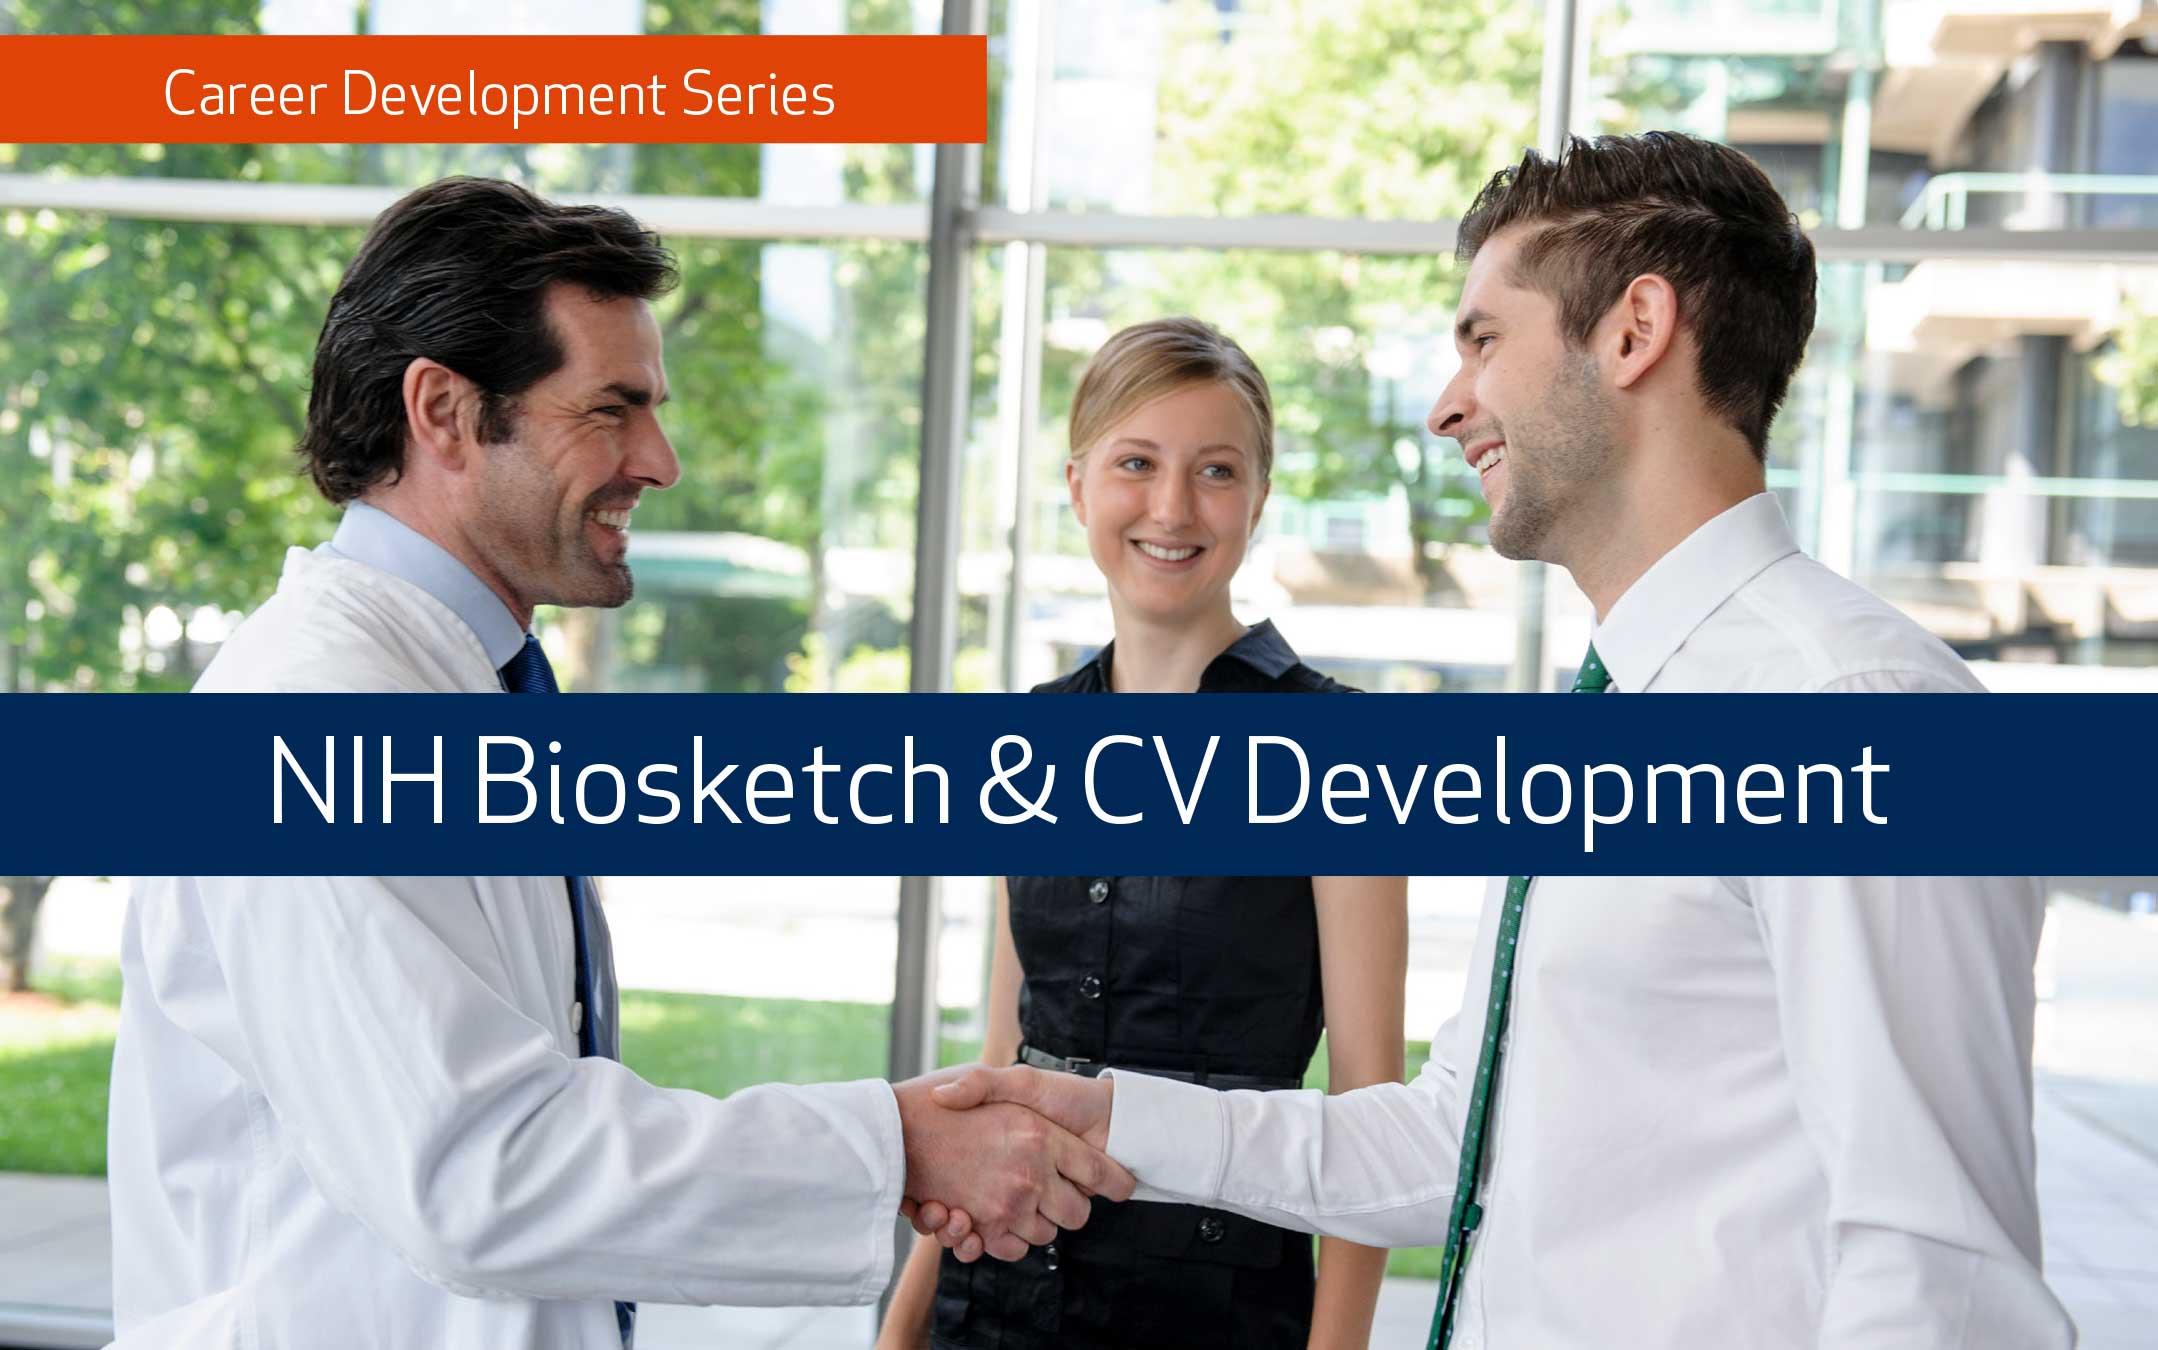 NIH-Biosketch-&-CV-Development_Cvent_518x324-new